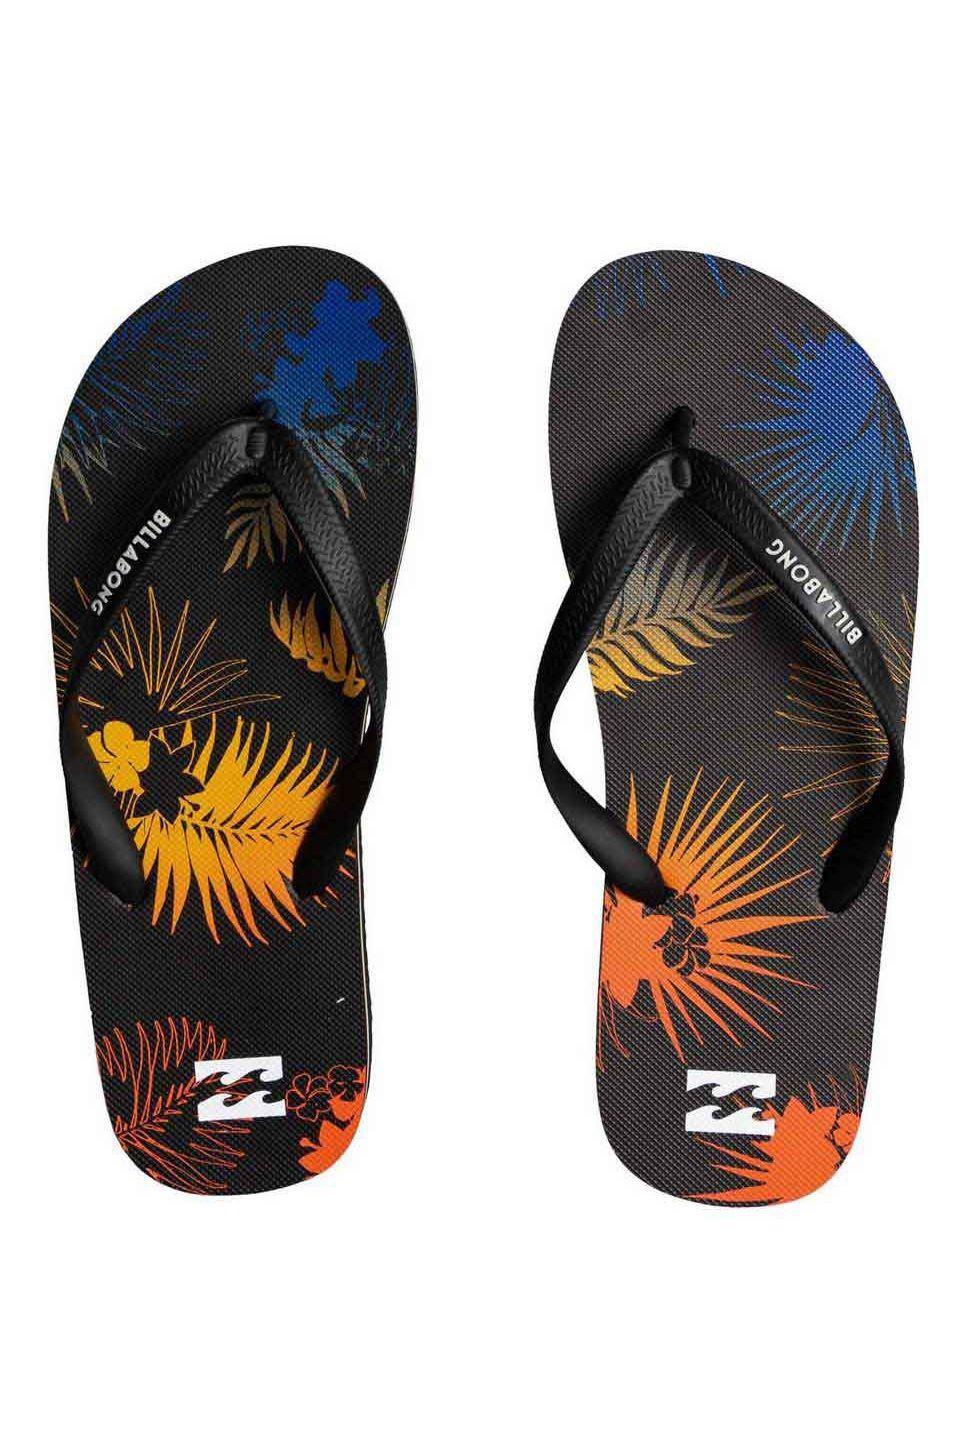 Billabong Sandals WAVES SPORTING GOOD PROGR. Black